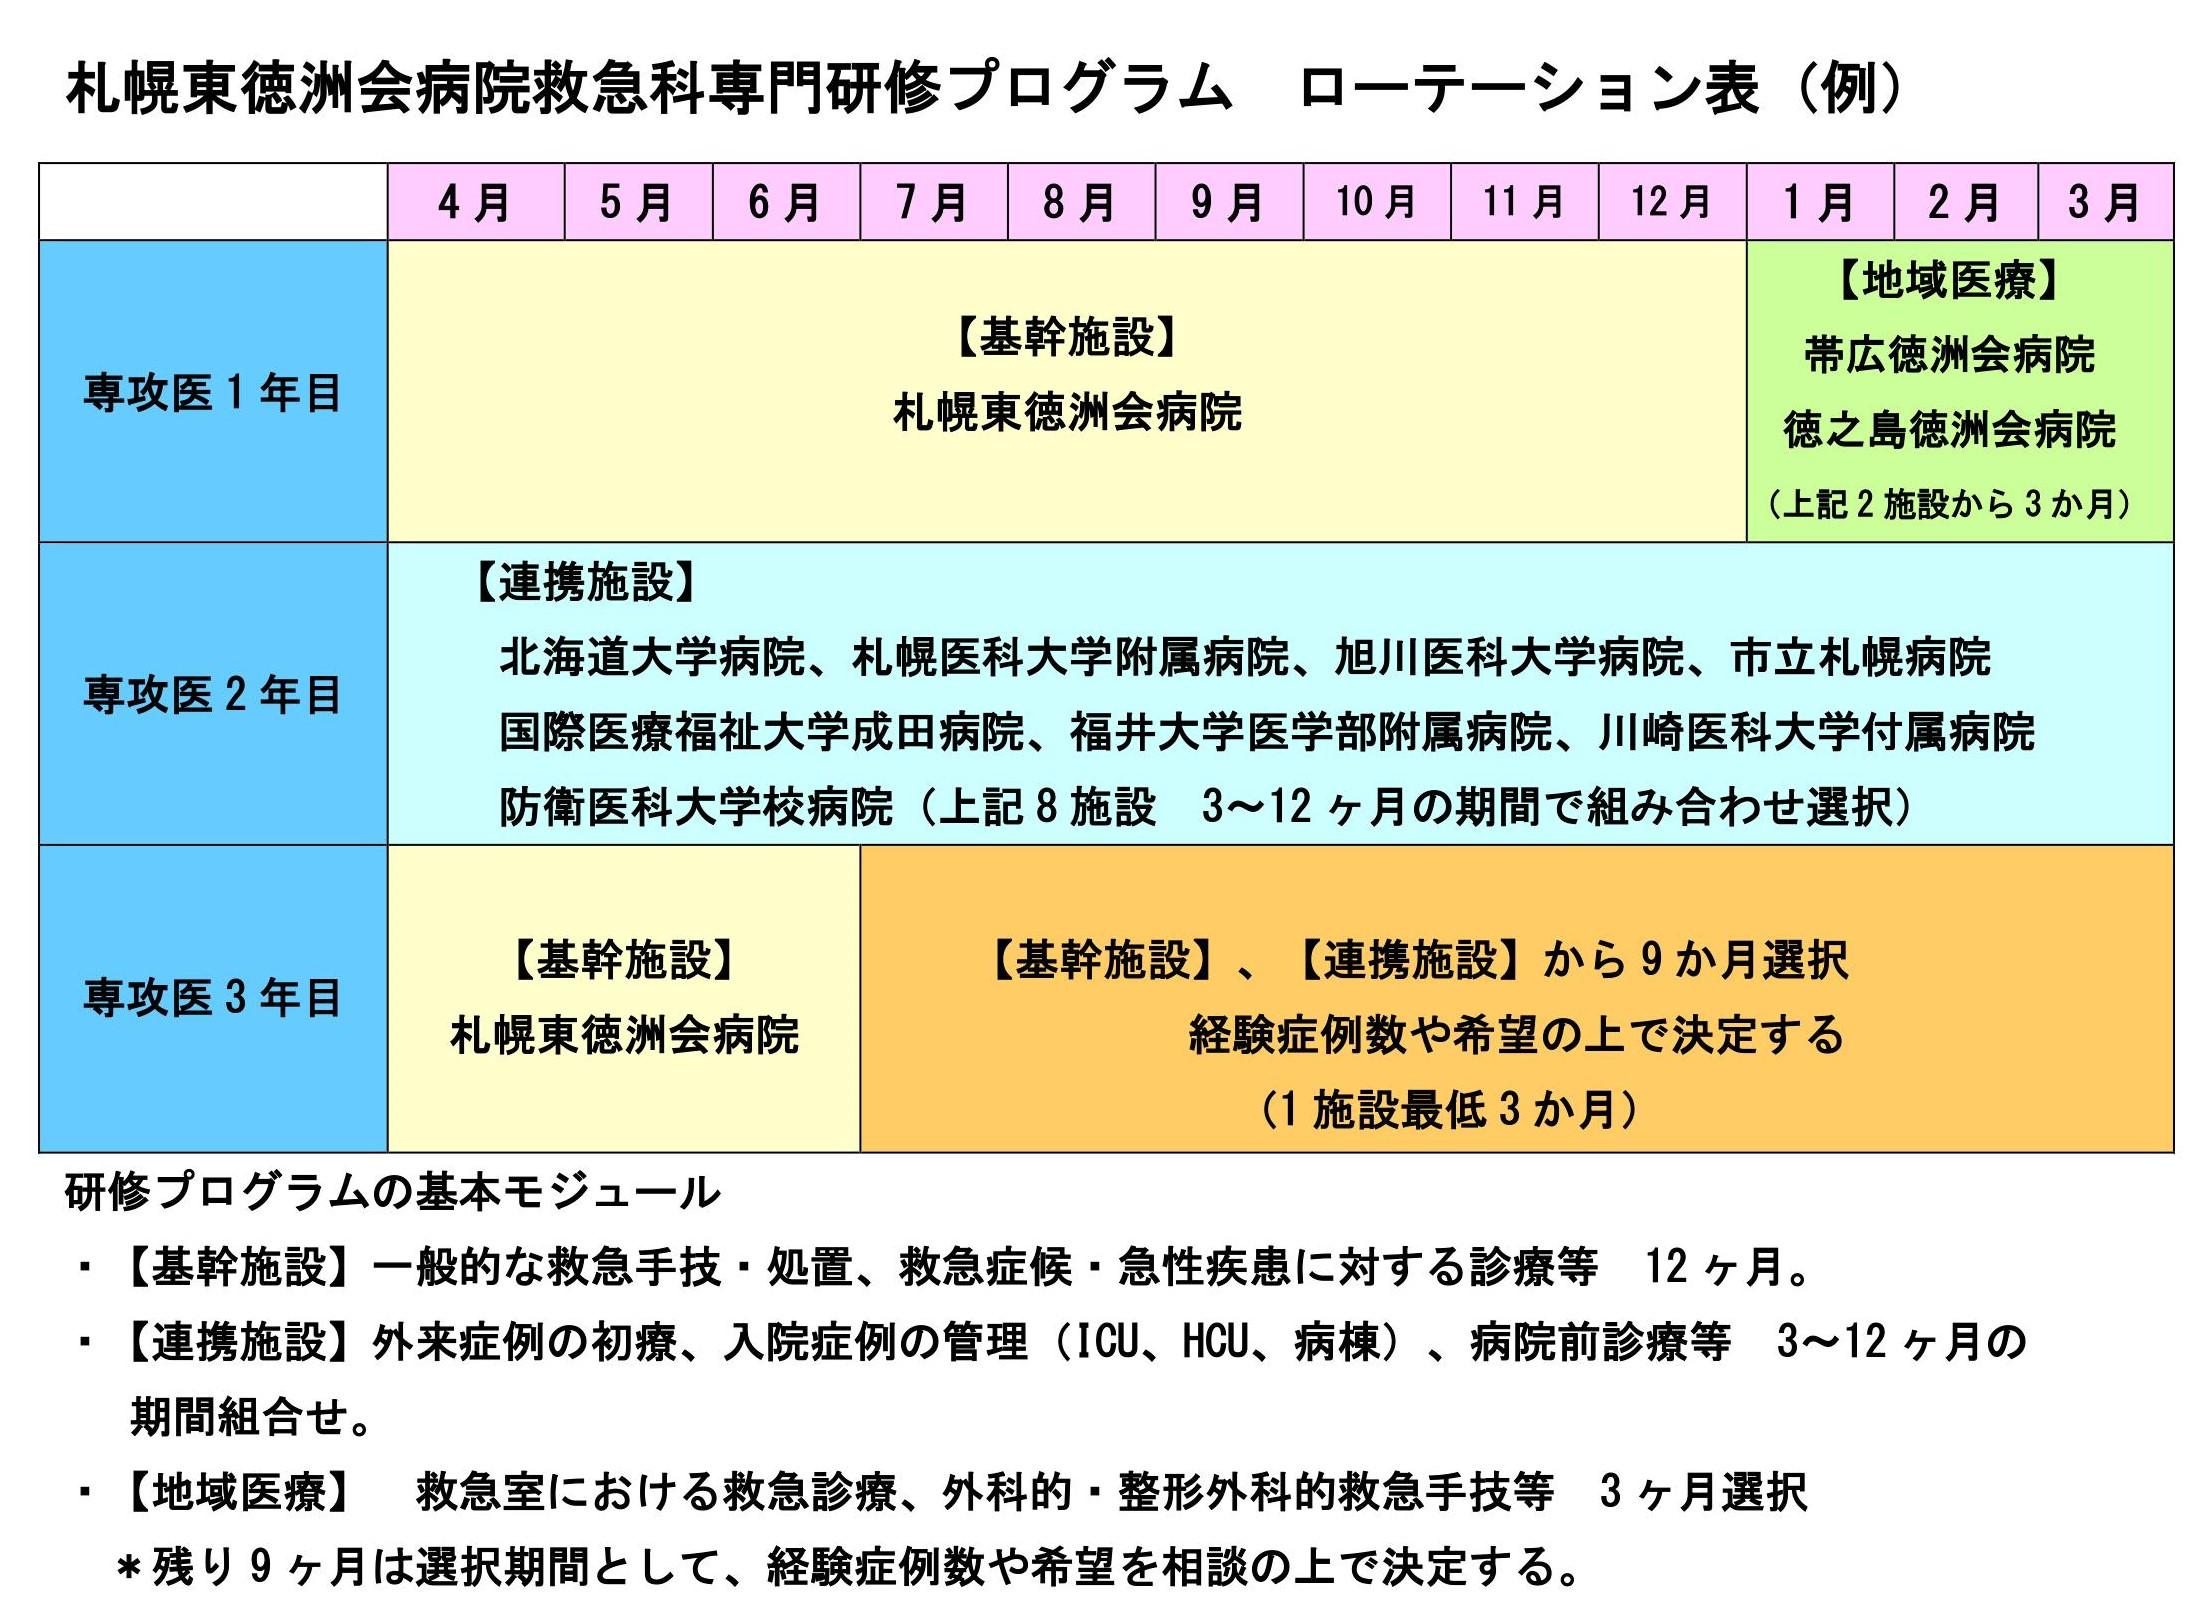 http://blog.higashi-tokushukai.or.jp/ydblog/0001%20%281%29.jpg